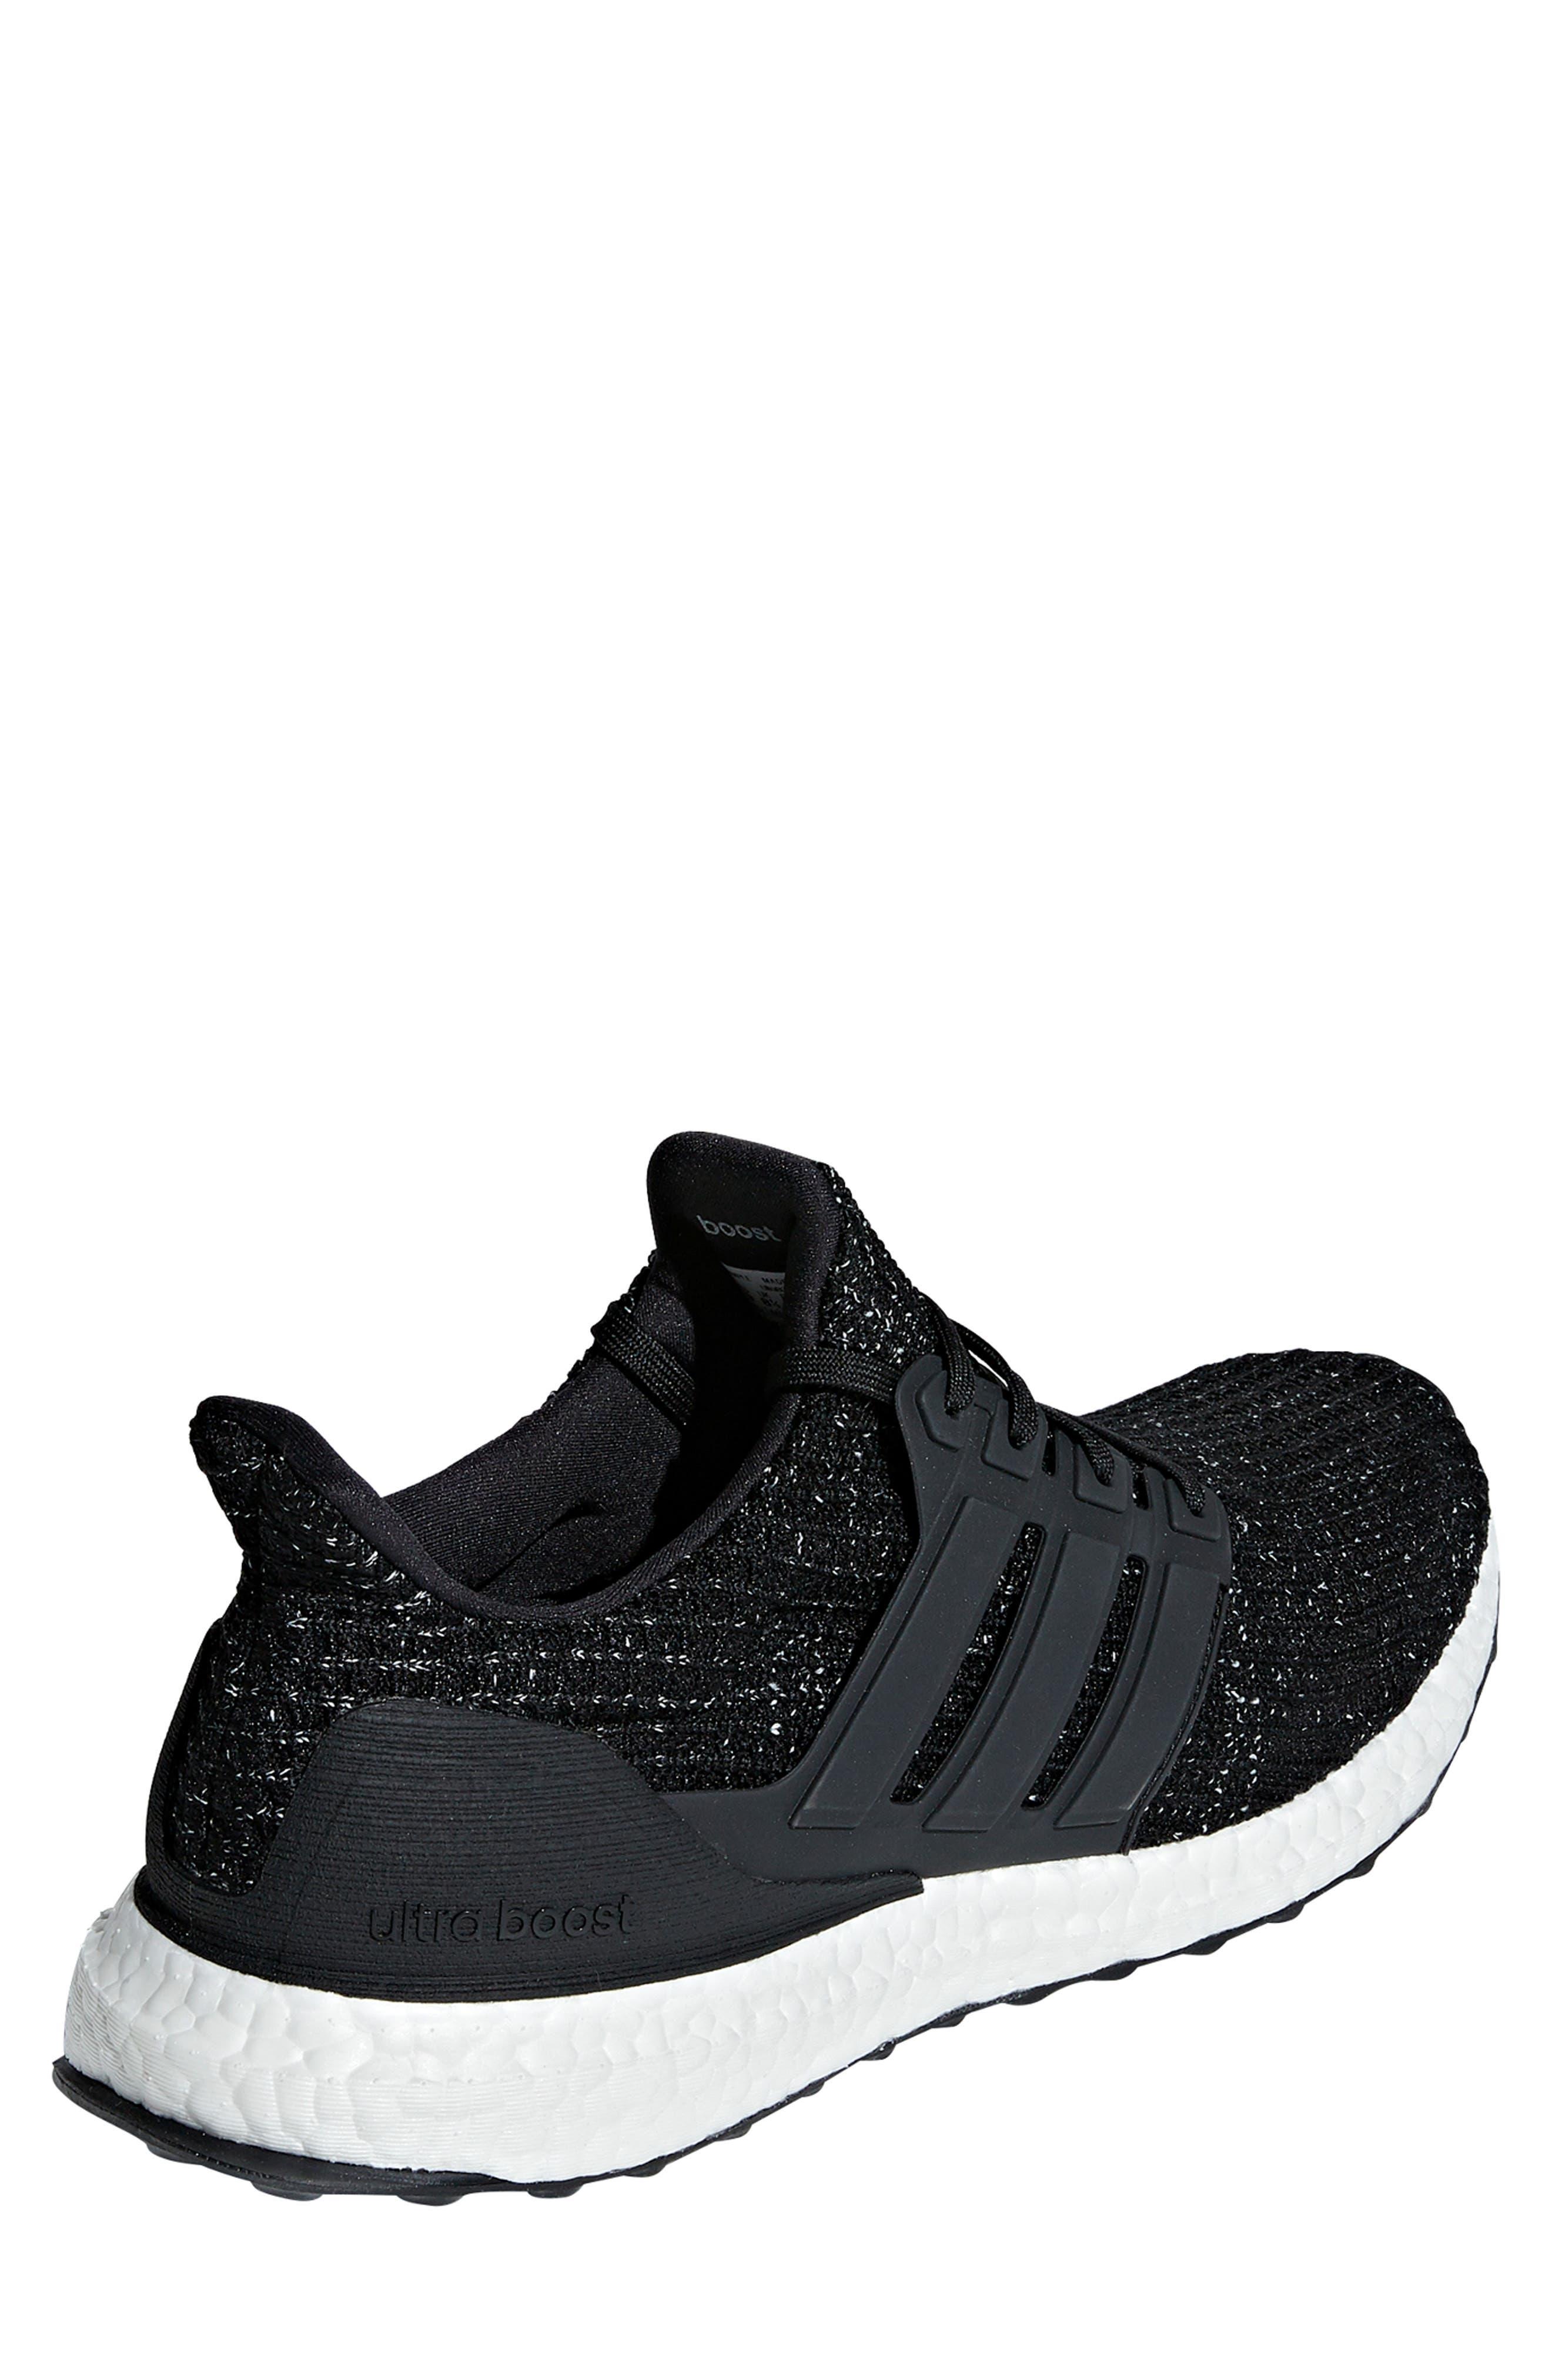 edb686612286f Men s Adidas Shoes